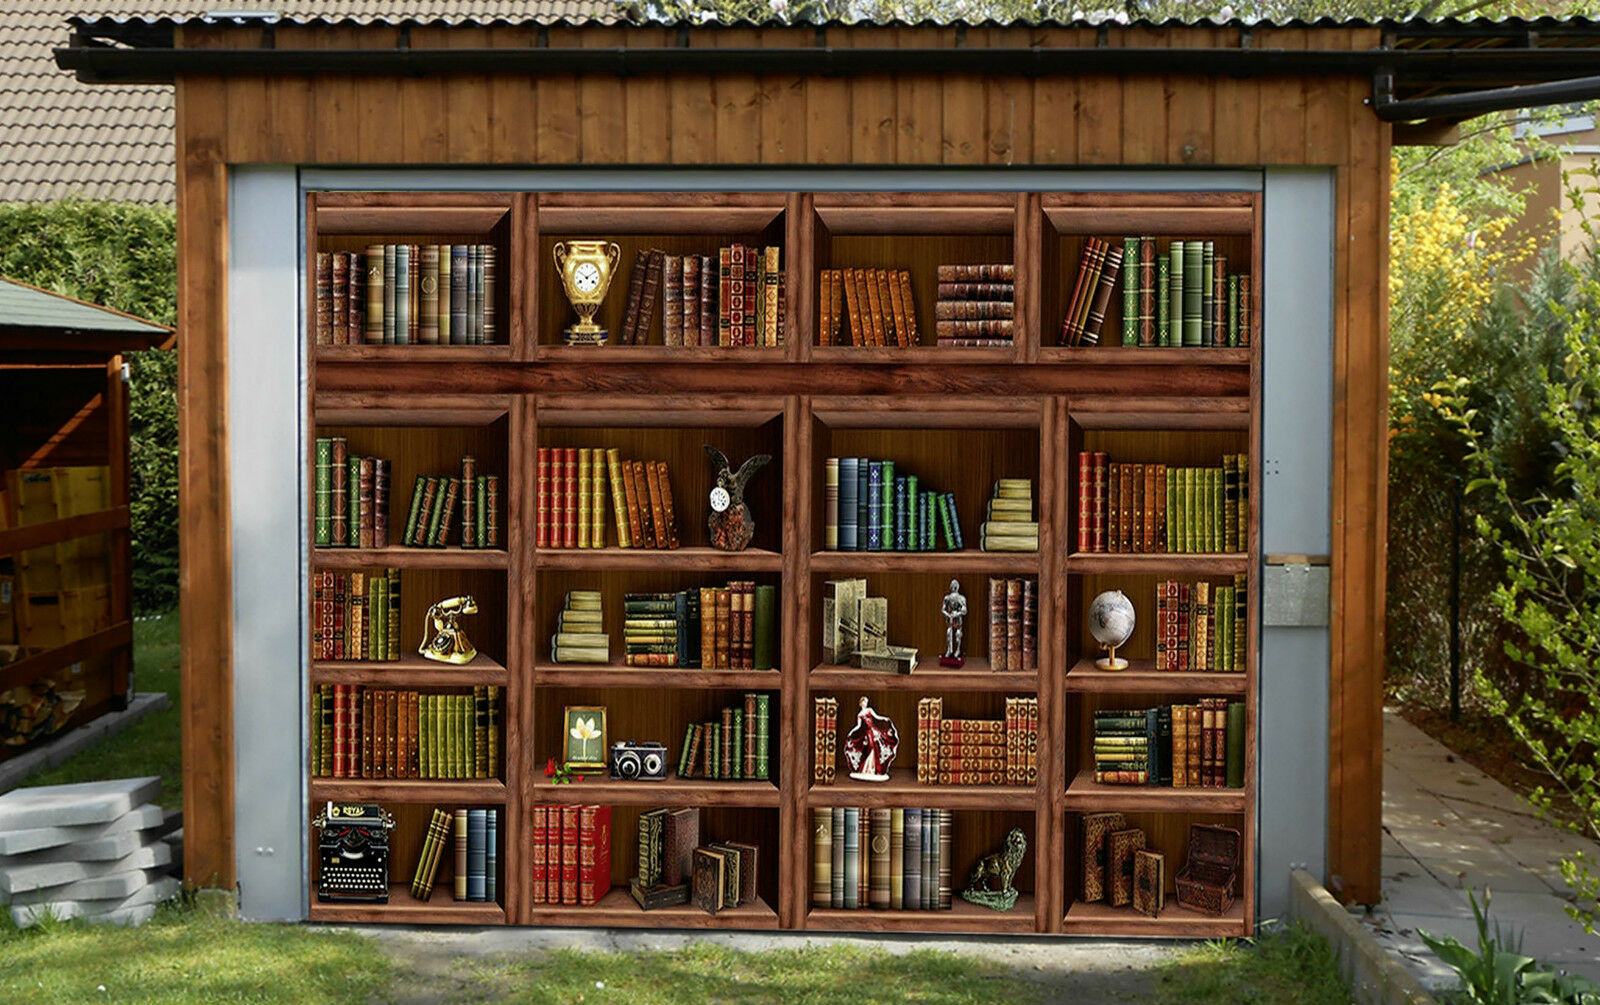 3D Book Wood Garage Door Murals Wall Print Decal Wall Deco AJ WALLPAPER IE